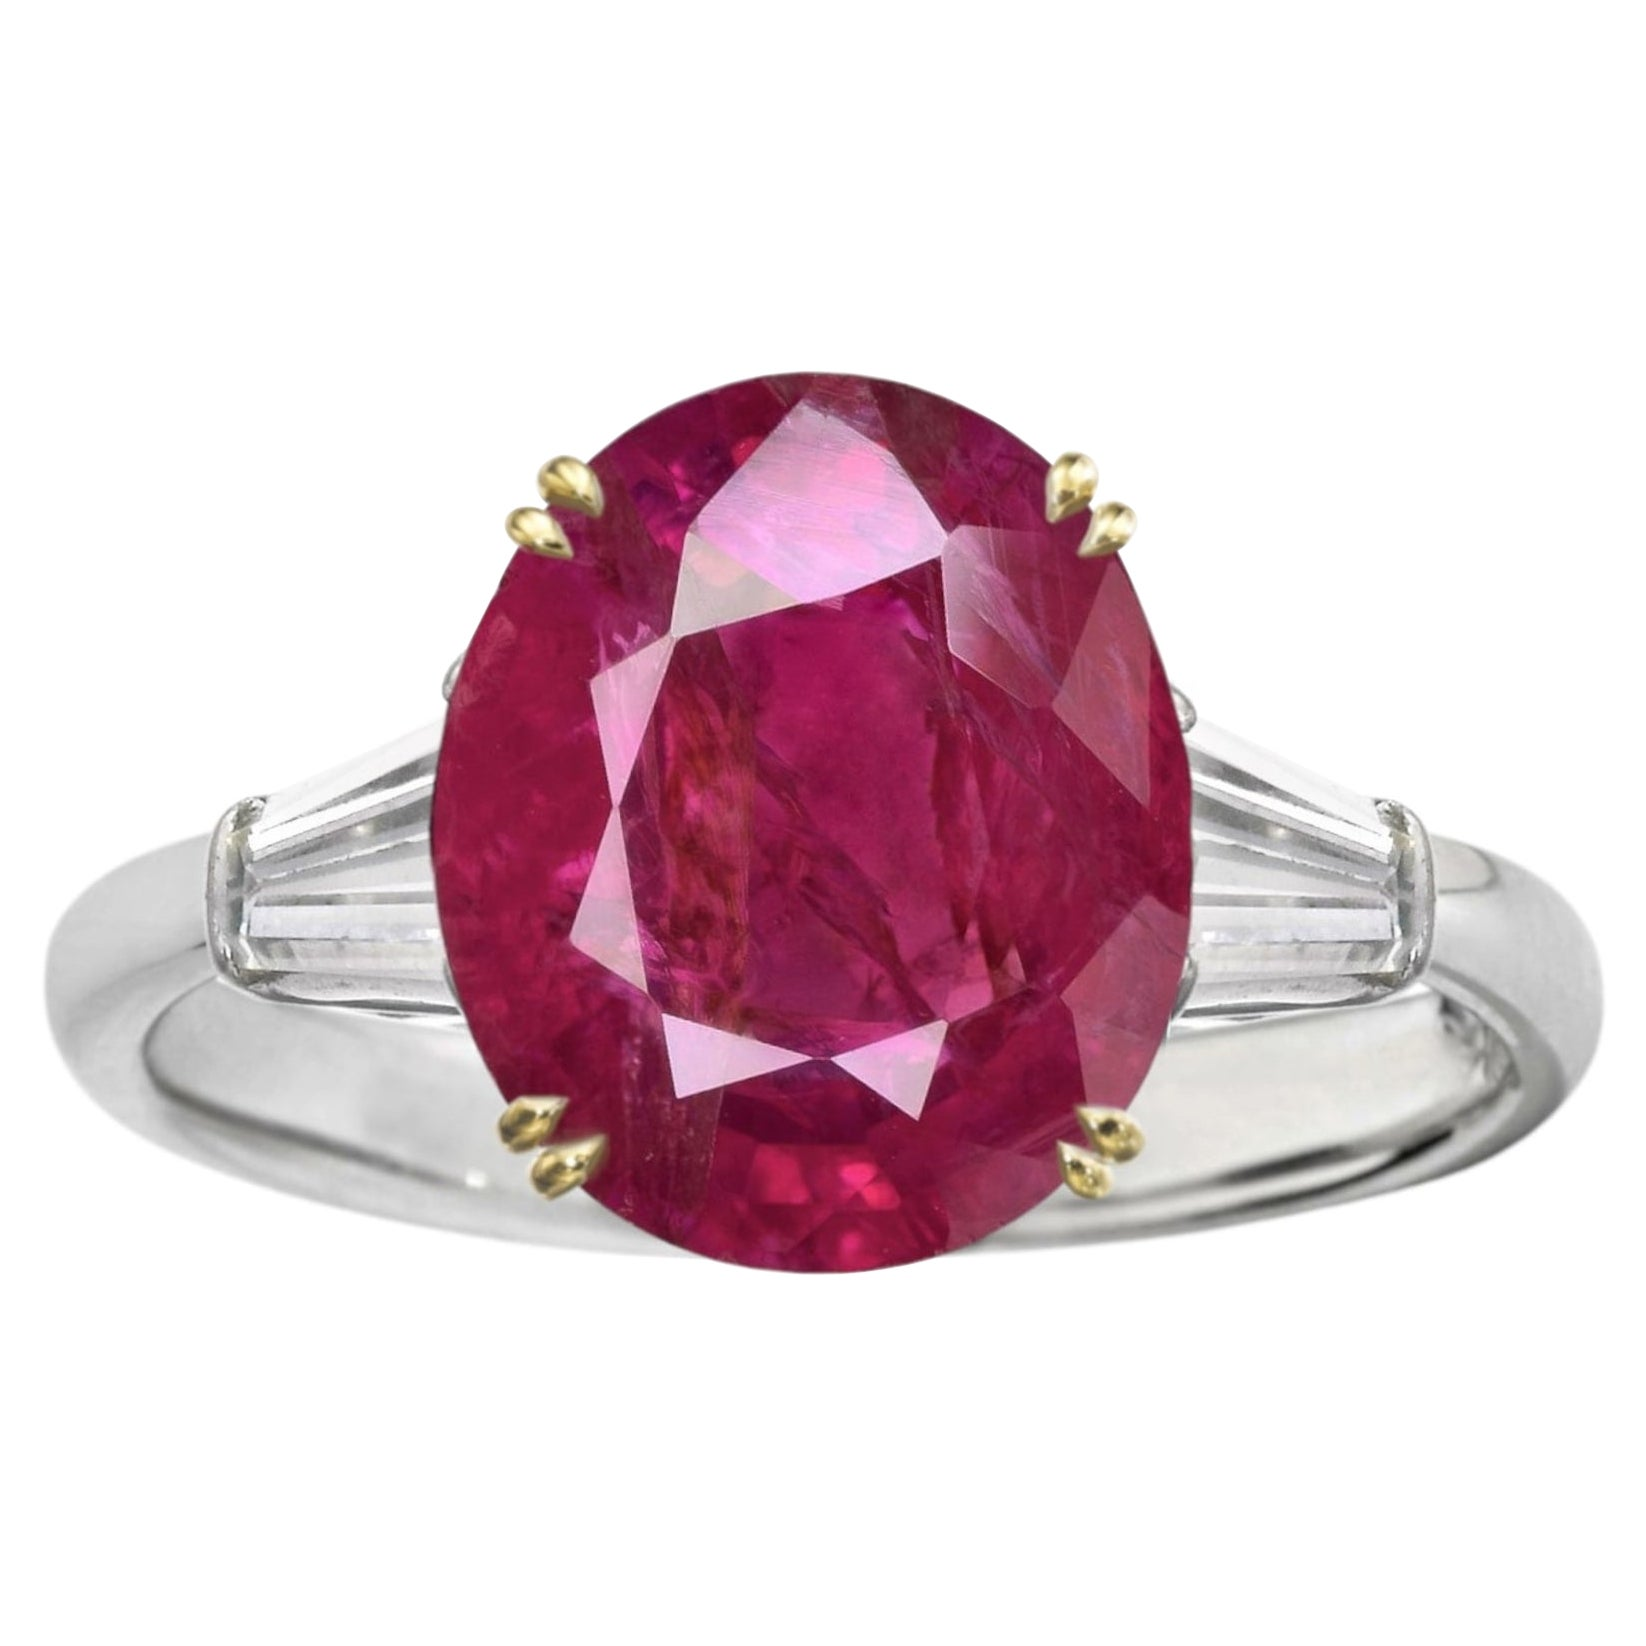 Antinori Fine Jewels Cocktail Rings